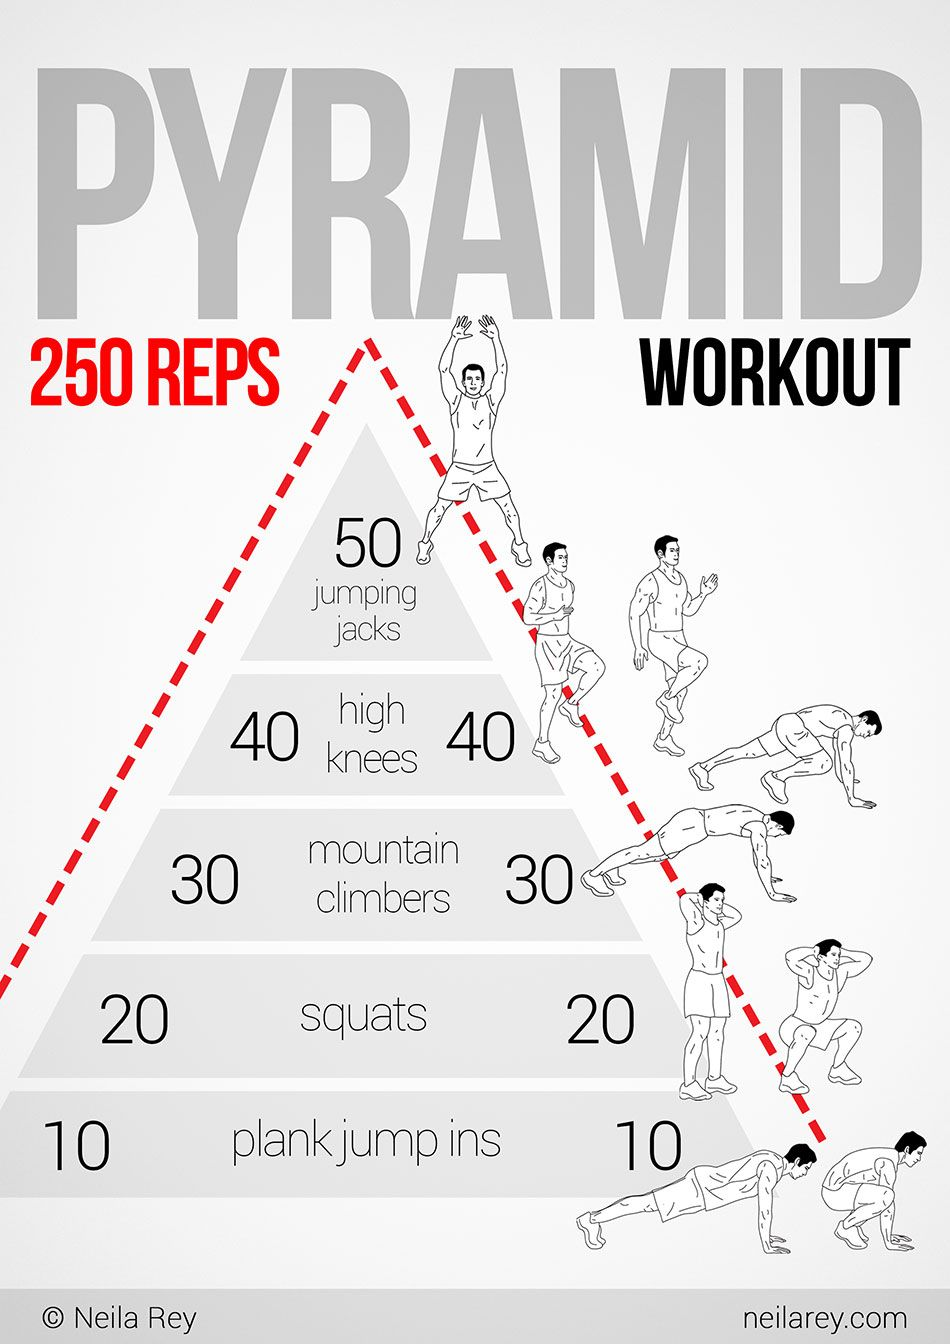 Pyramid Bench Press Workout Routine